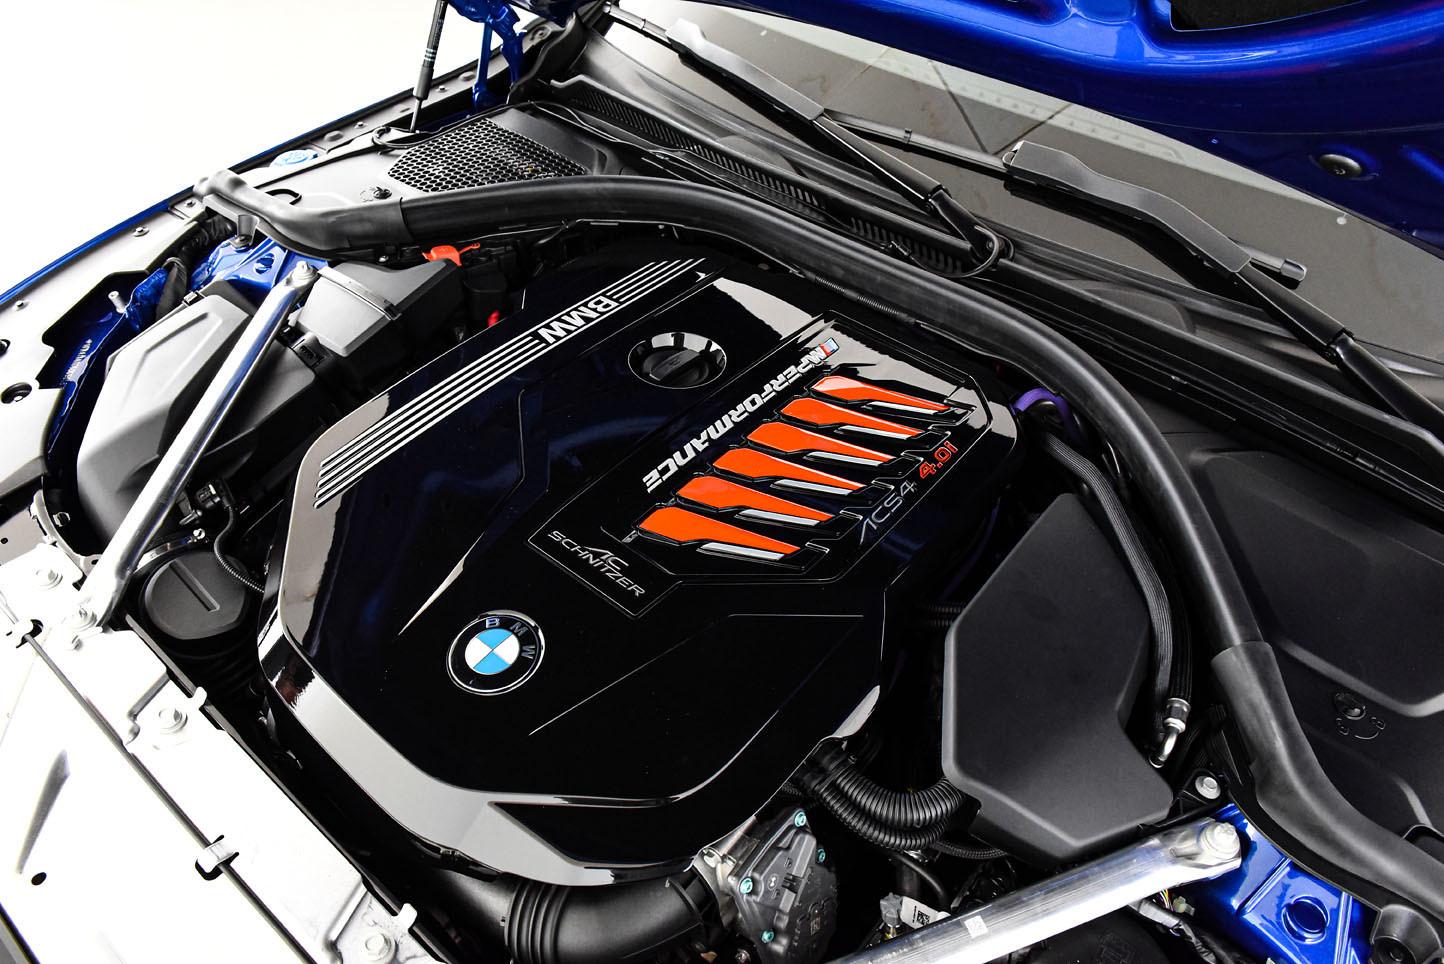 BMW Seria 4 de la AC Schnitzer - Galerie Foto - BMW Seria 4 de la AC Schnitzer - Galerie Foto